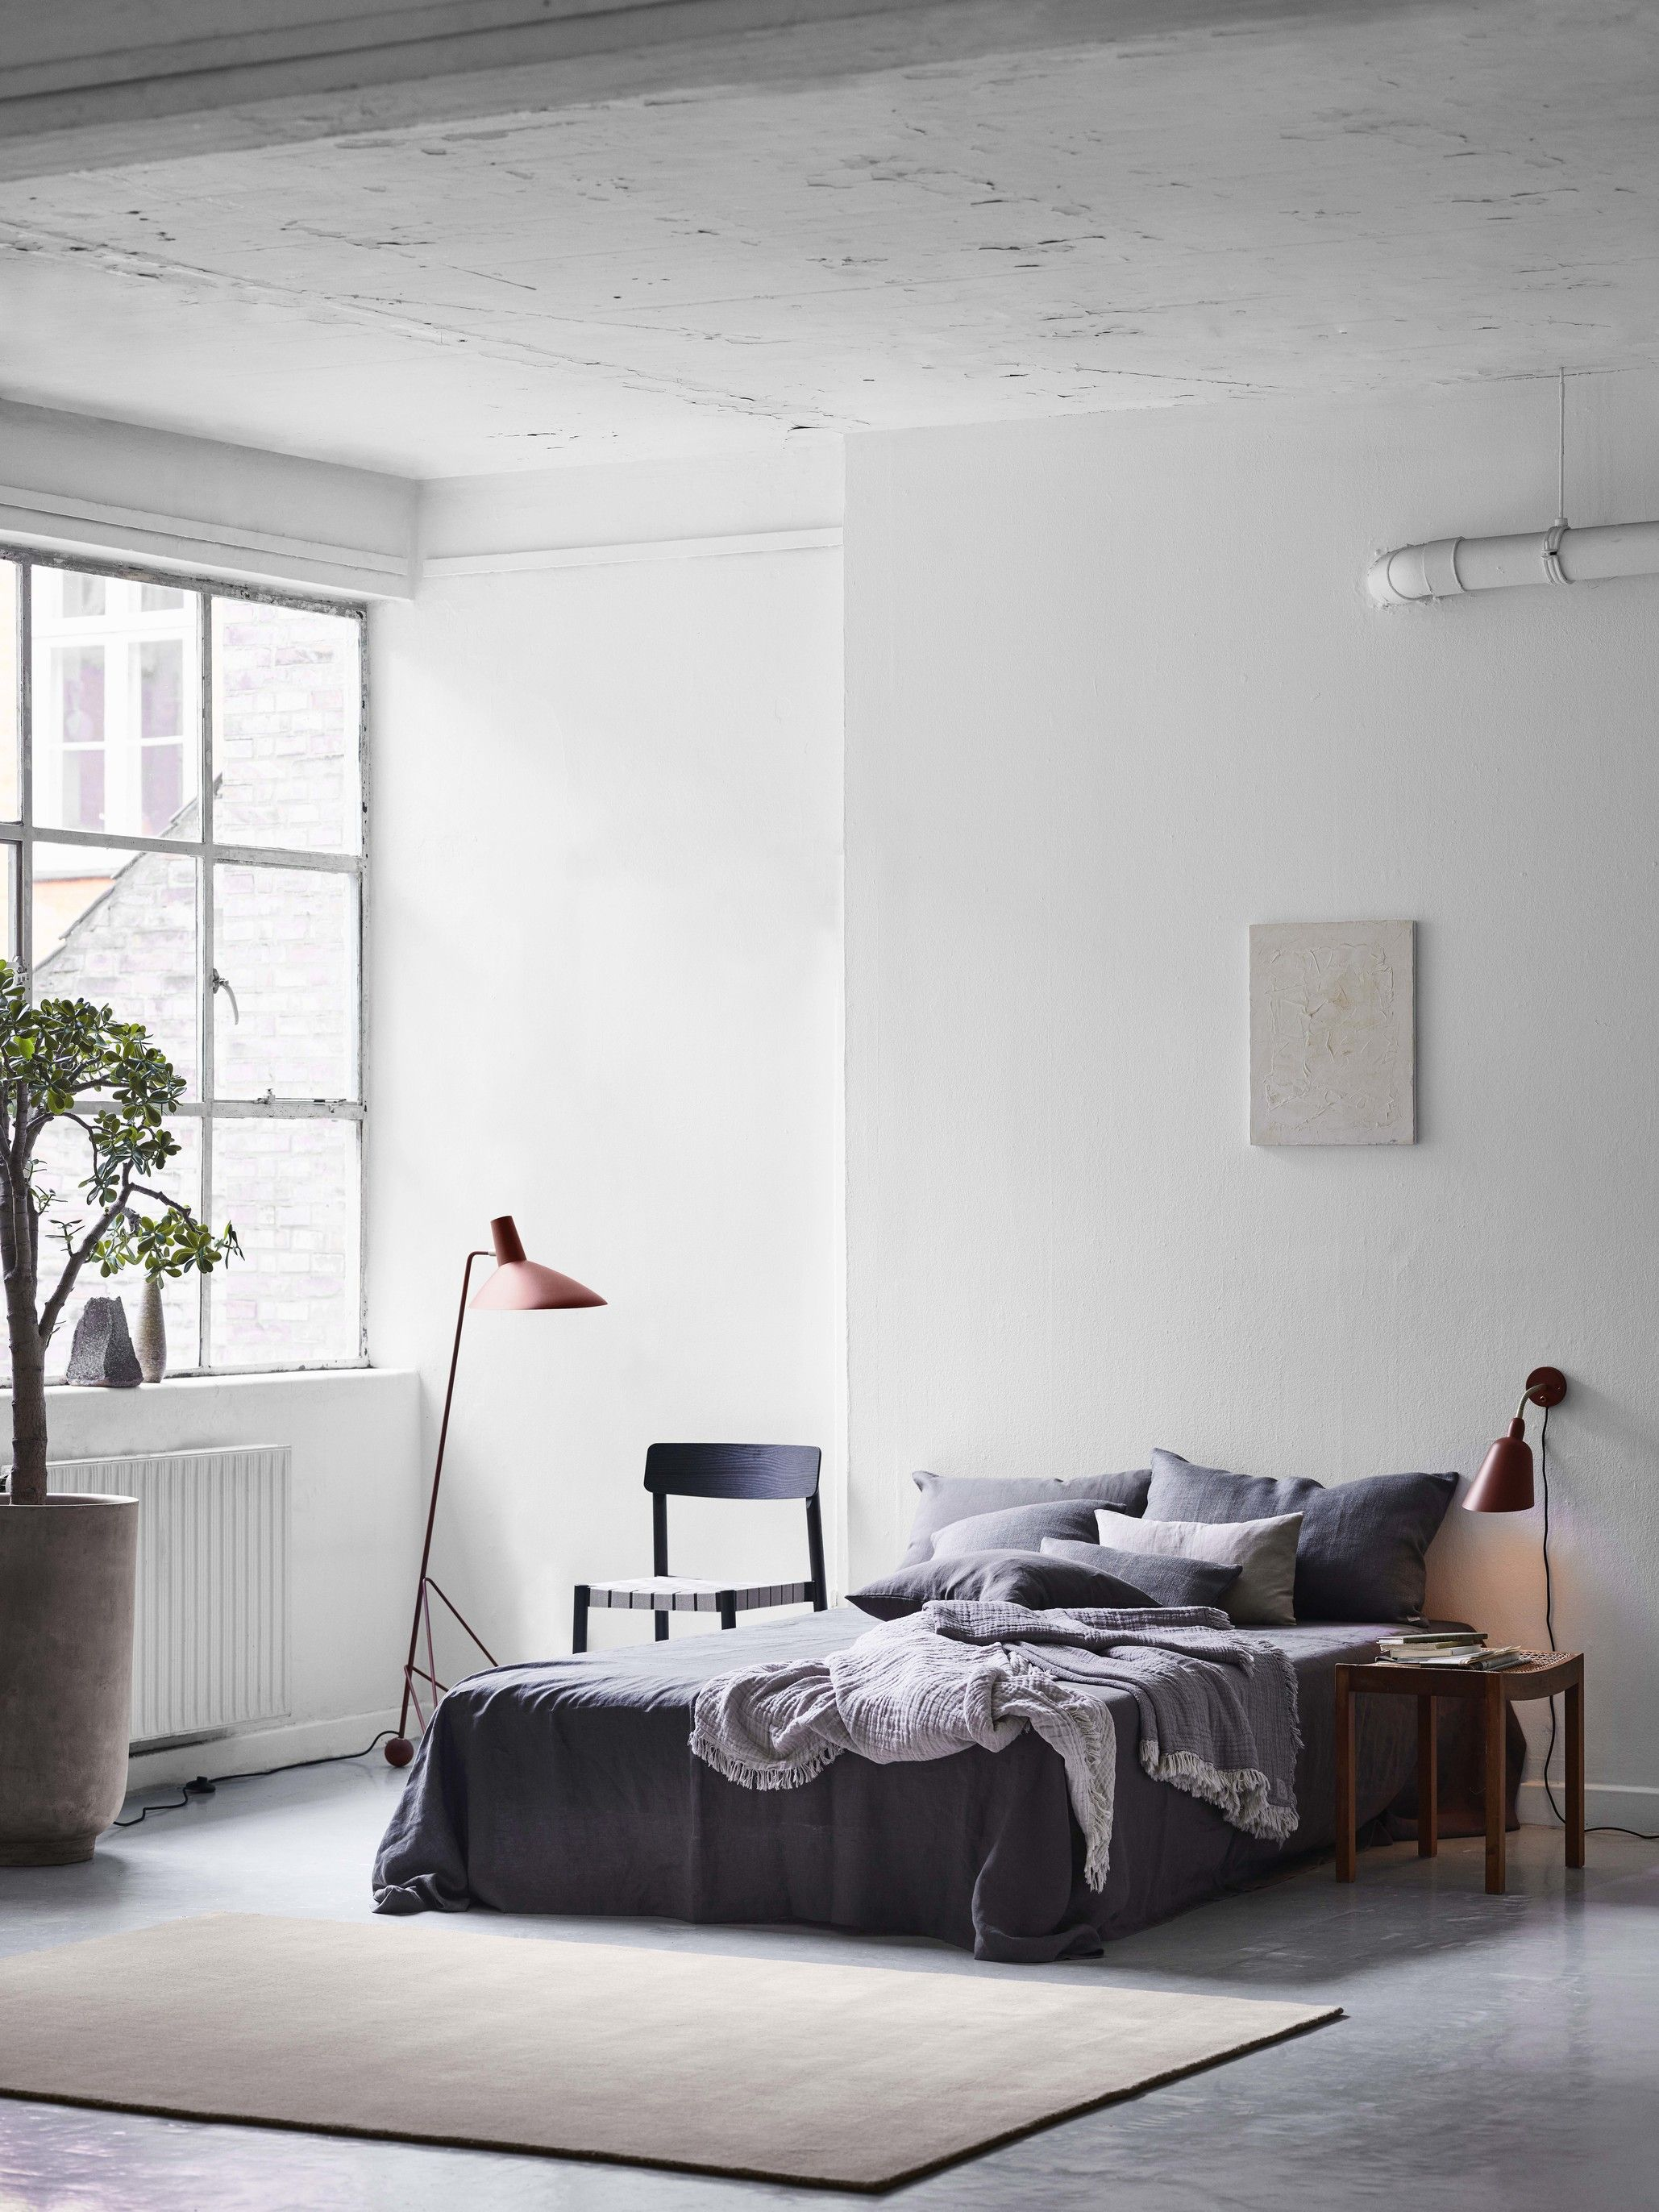 My Top Picks From Stockholm Furniture Fair 2020 Part 1 In 2020 Minimalist Bedroom Minimalist Bedroom Decor Modern Scandinavian Bedroom